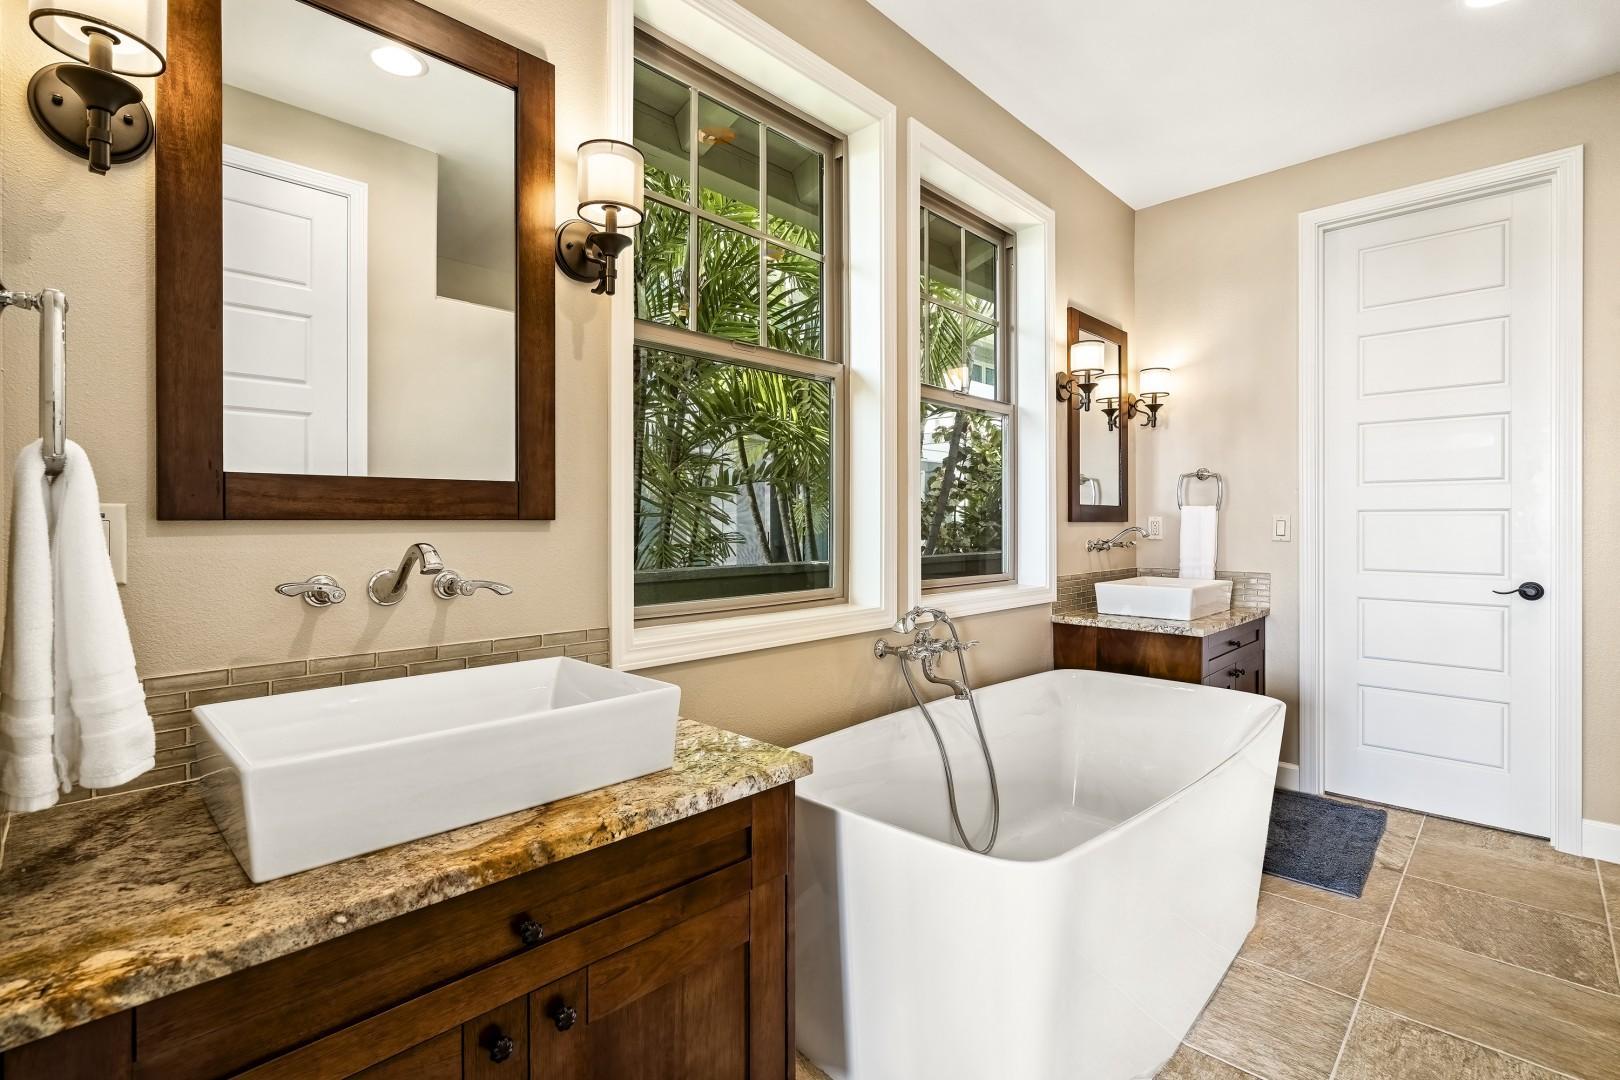 Luxurious Master bathroom with oversized soaking tub